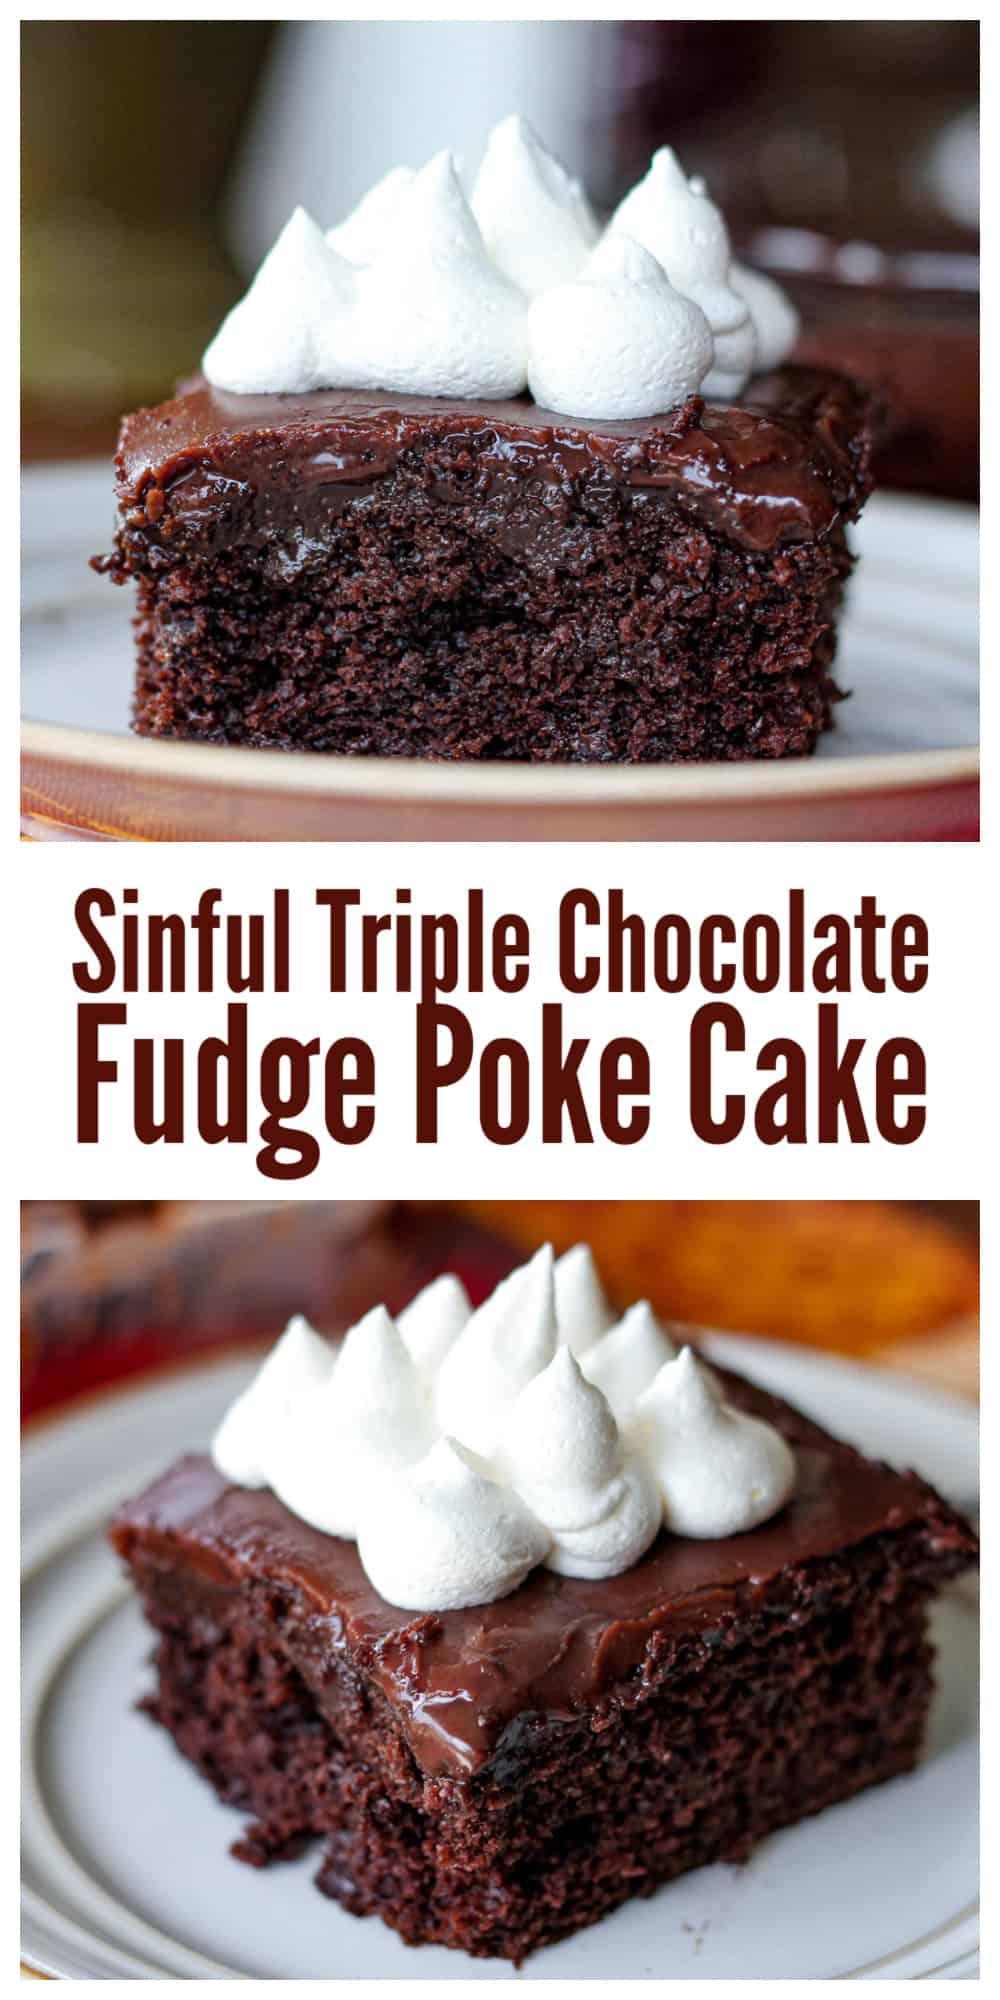 Sinful Triple Chocolate Fudge Poke Cake